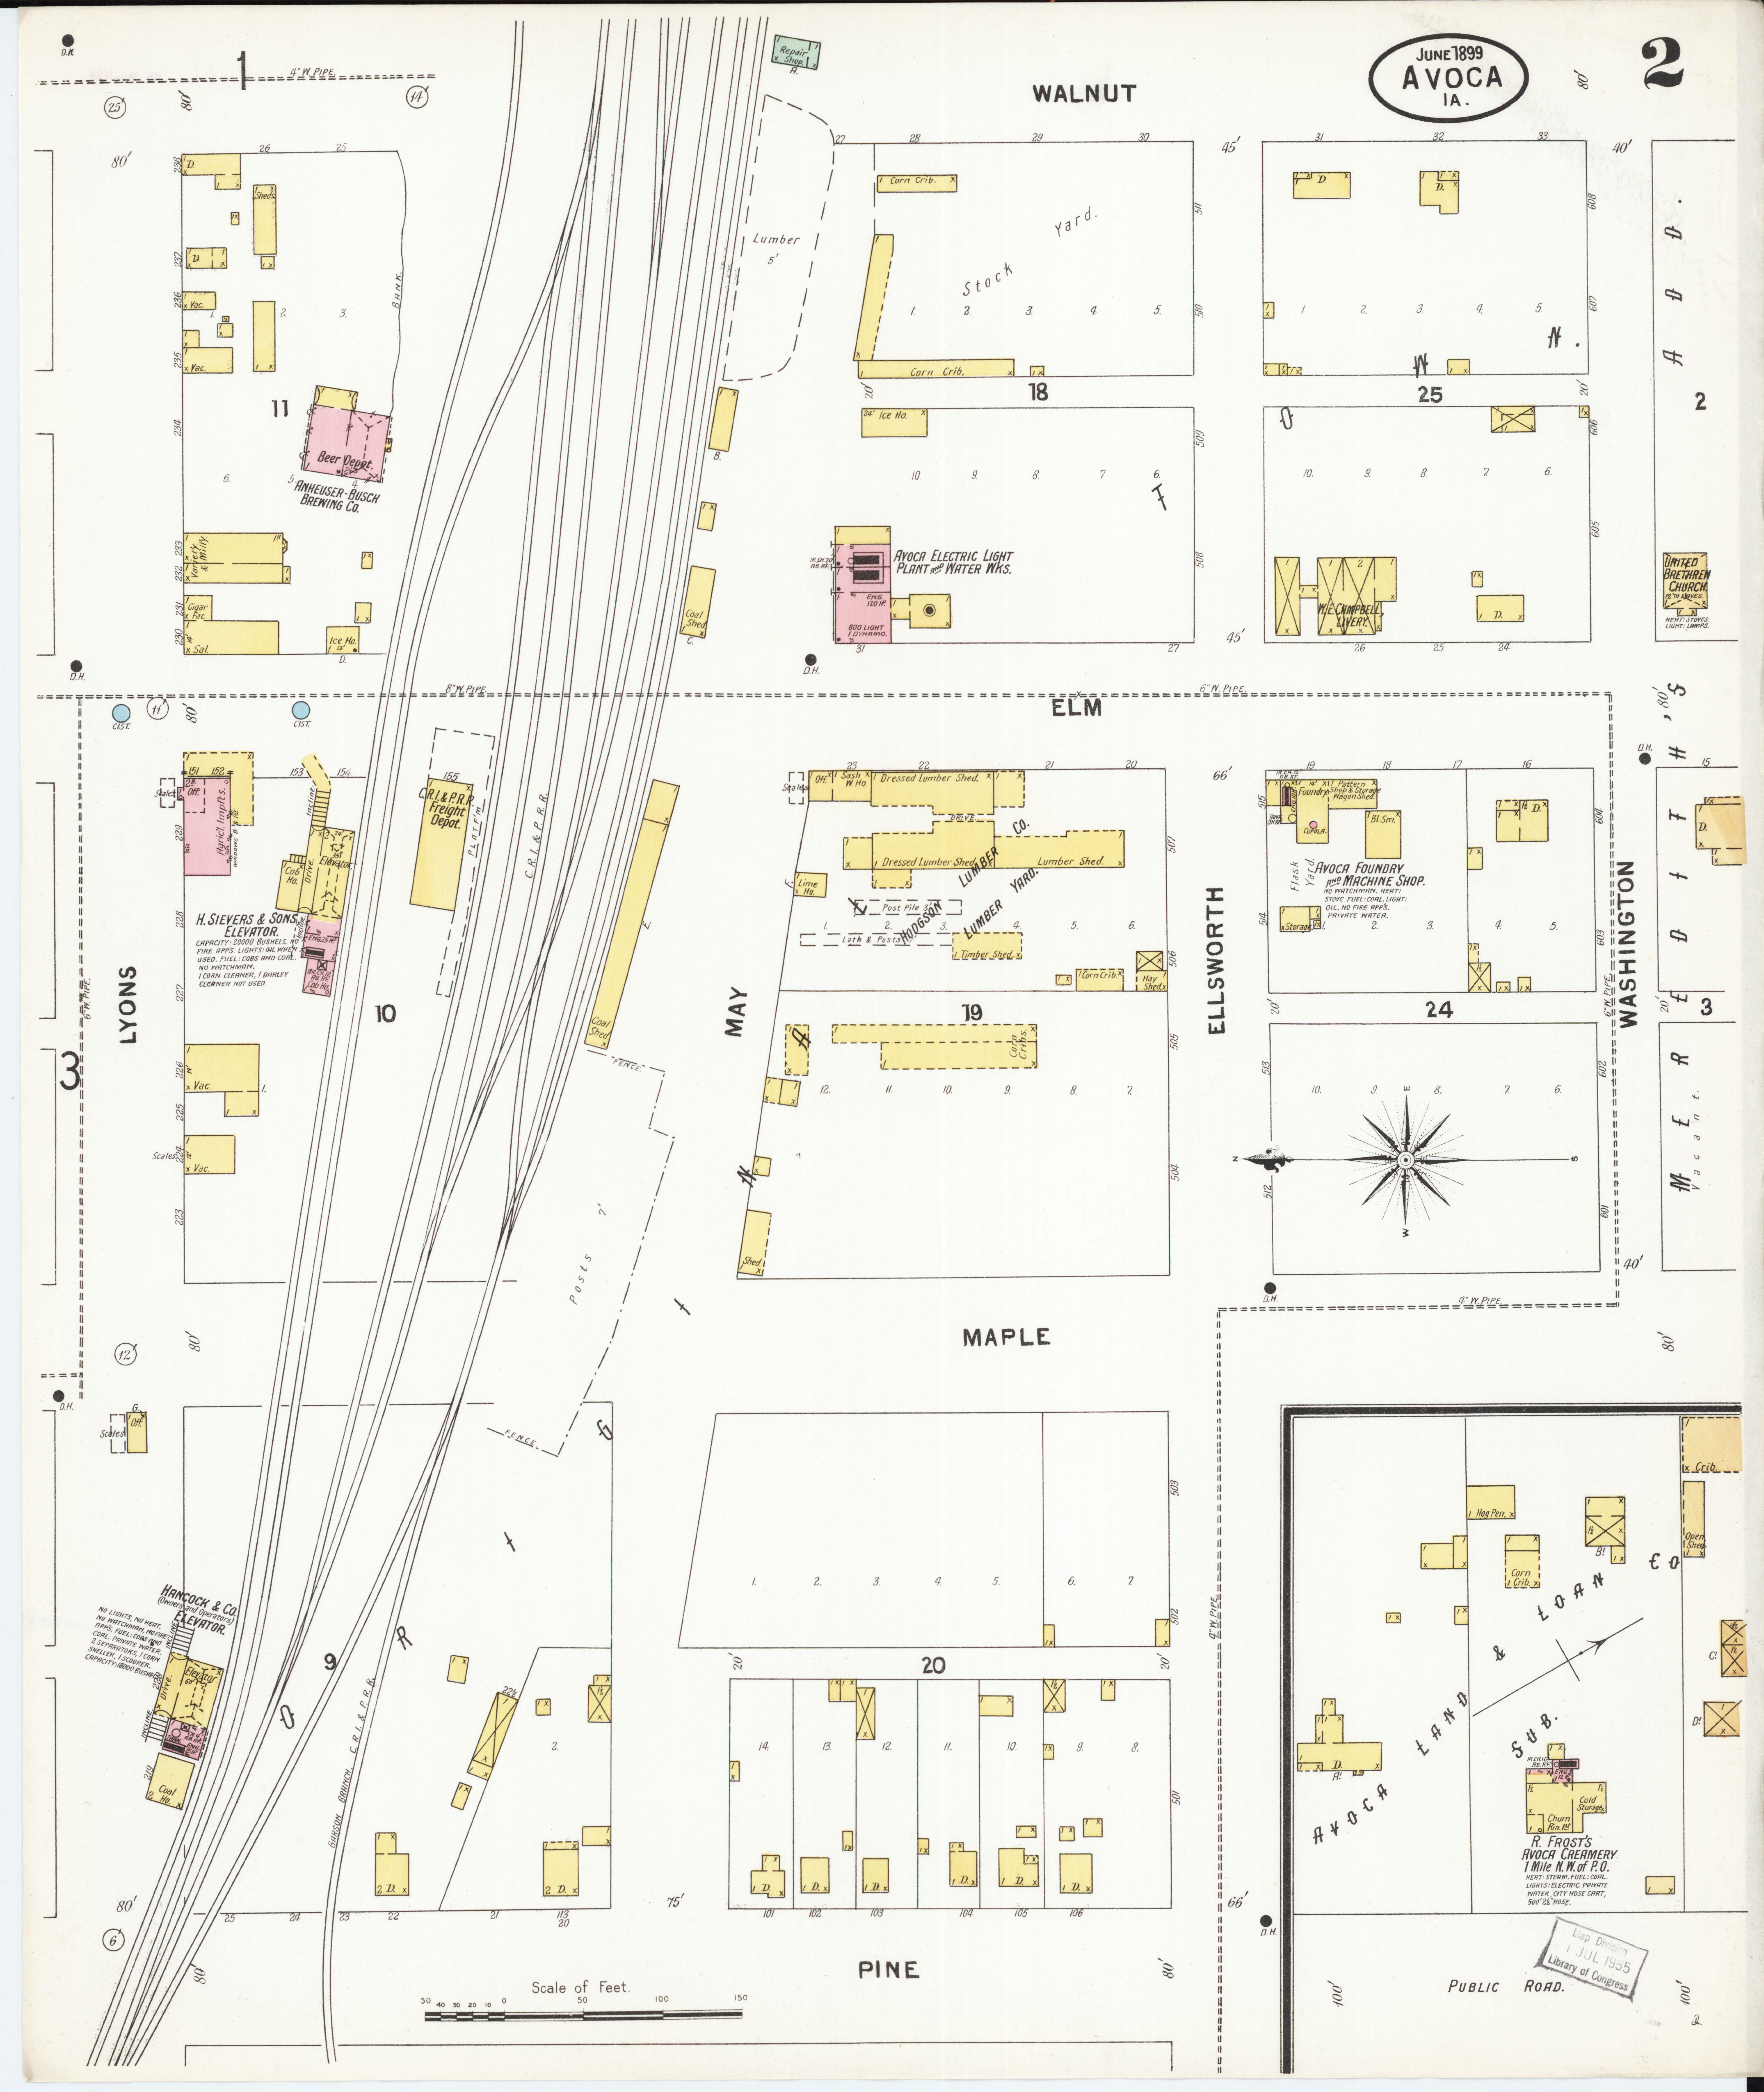 Avoca Iowa Map.File Sanborn Fire Insurance Map From Avoca Pottawattamie County